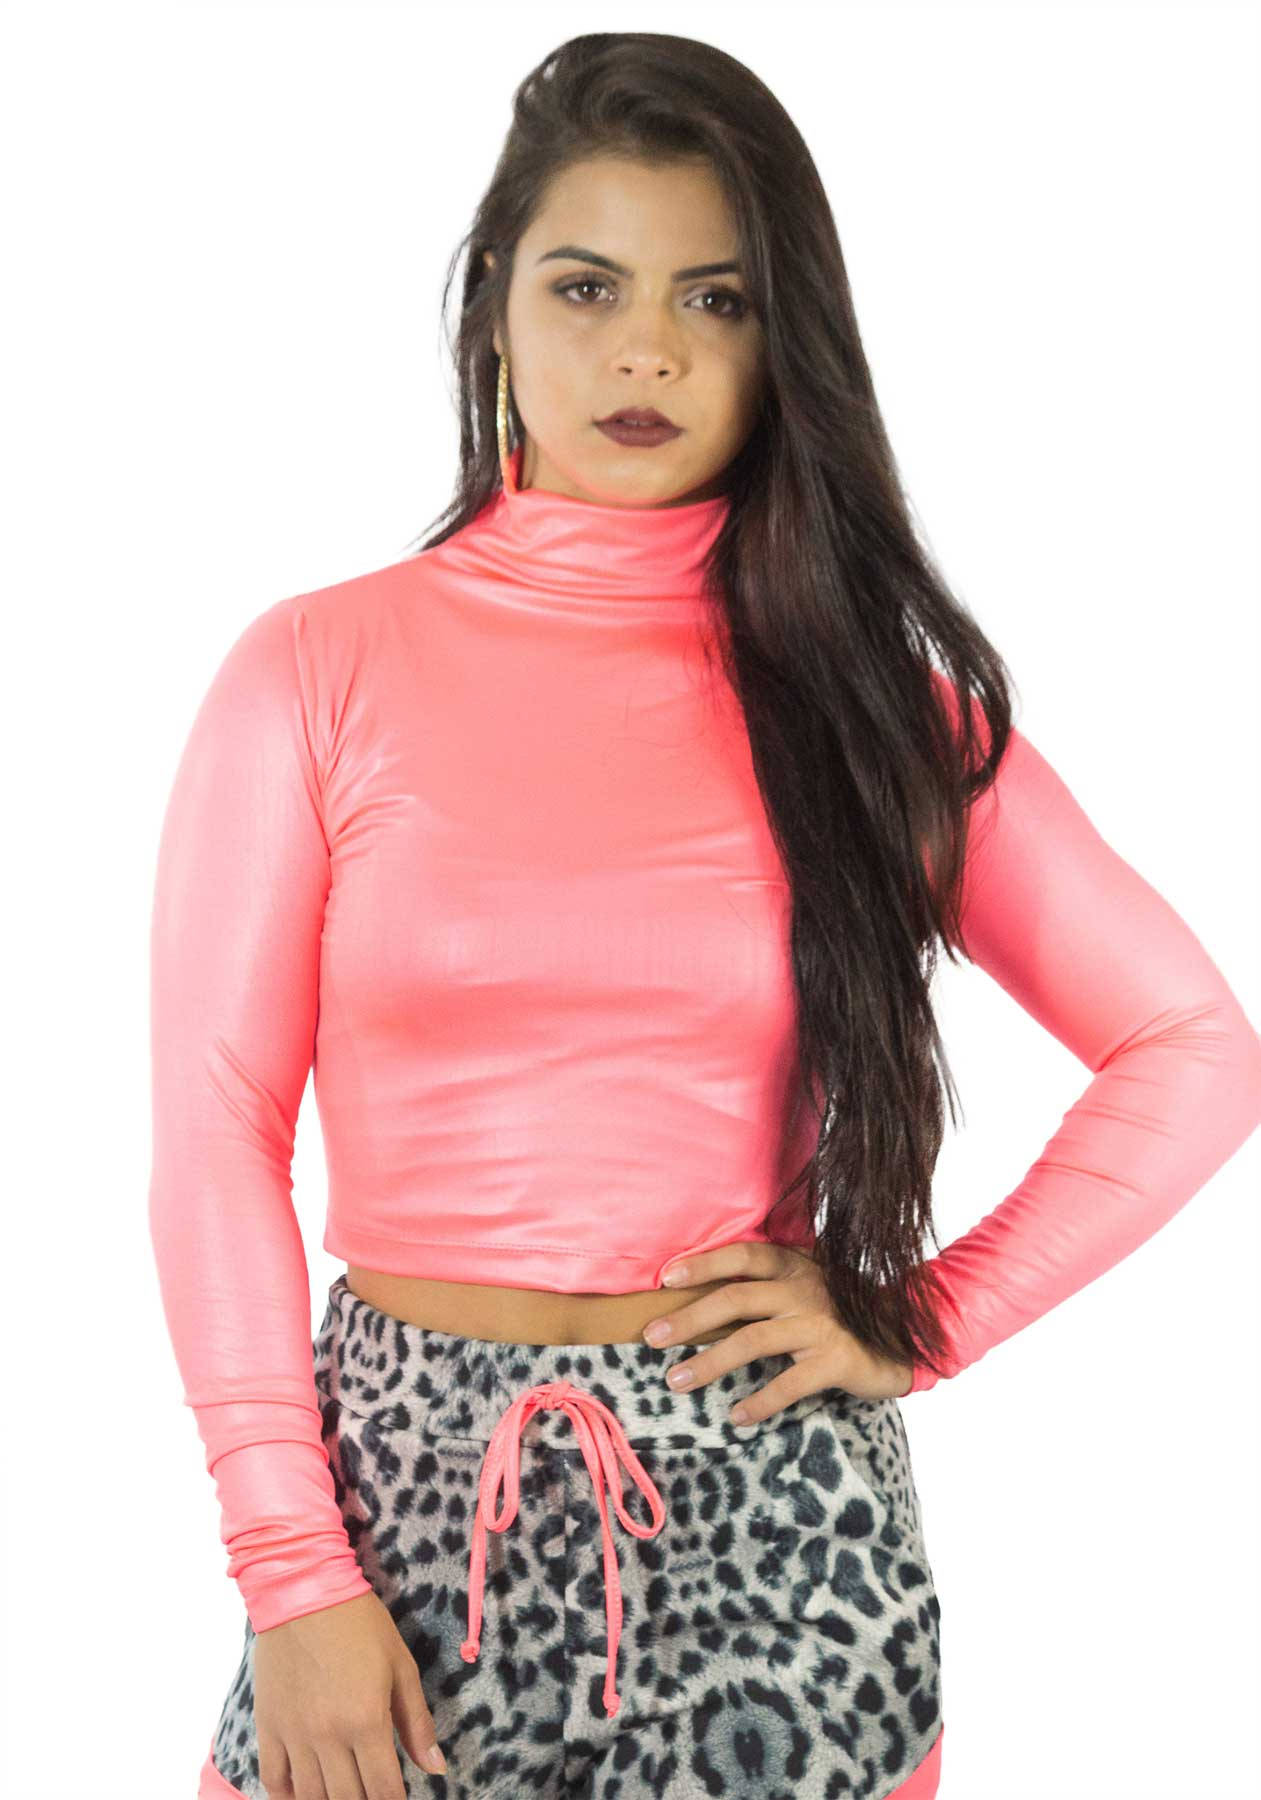 aa97060528 NotoriaStore  Moda Feminina Florianópolis - Online Blusa gola alta Neon